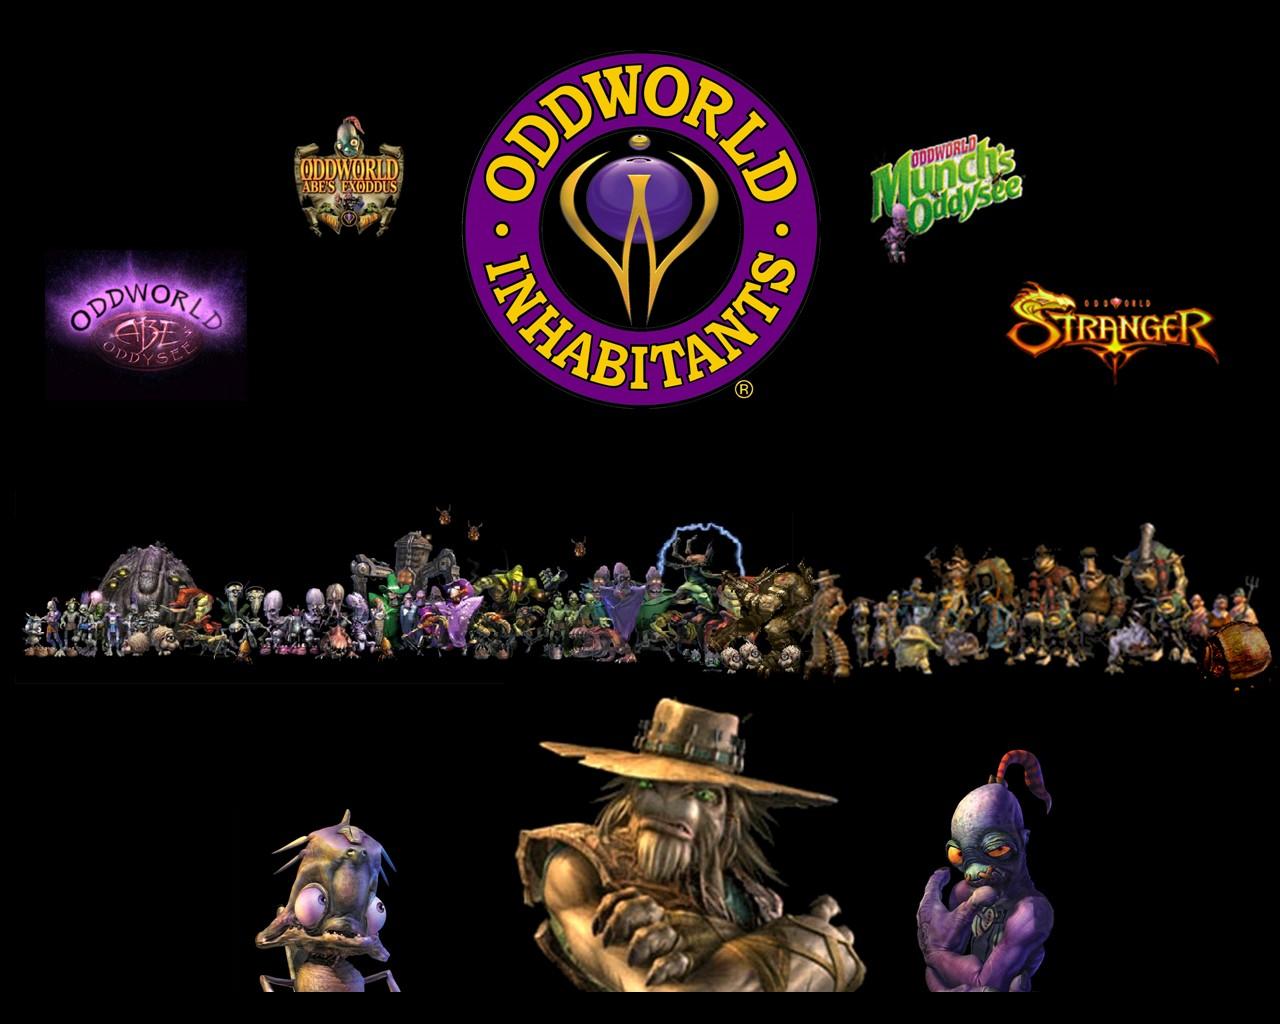 Oddworld series